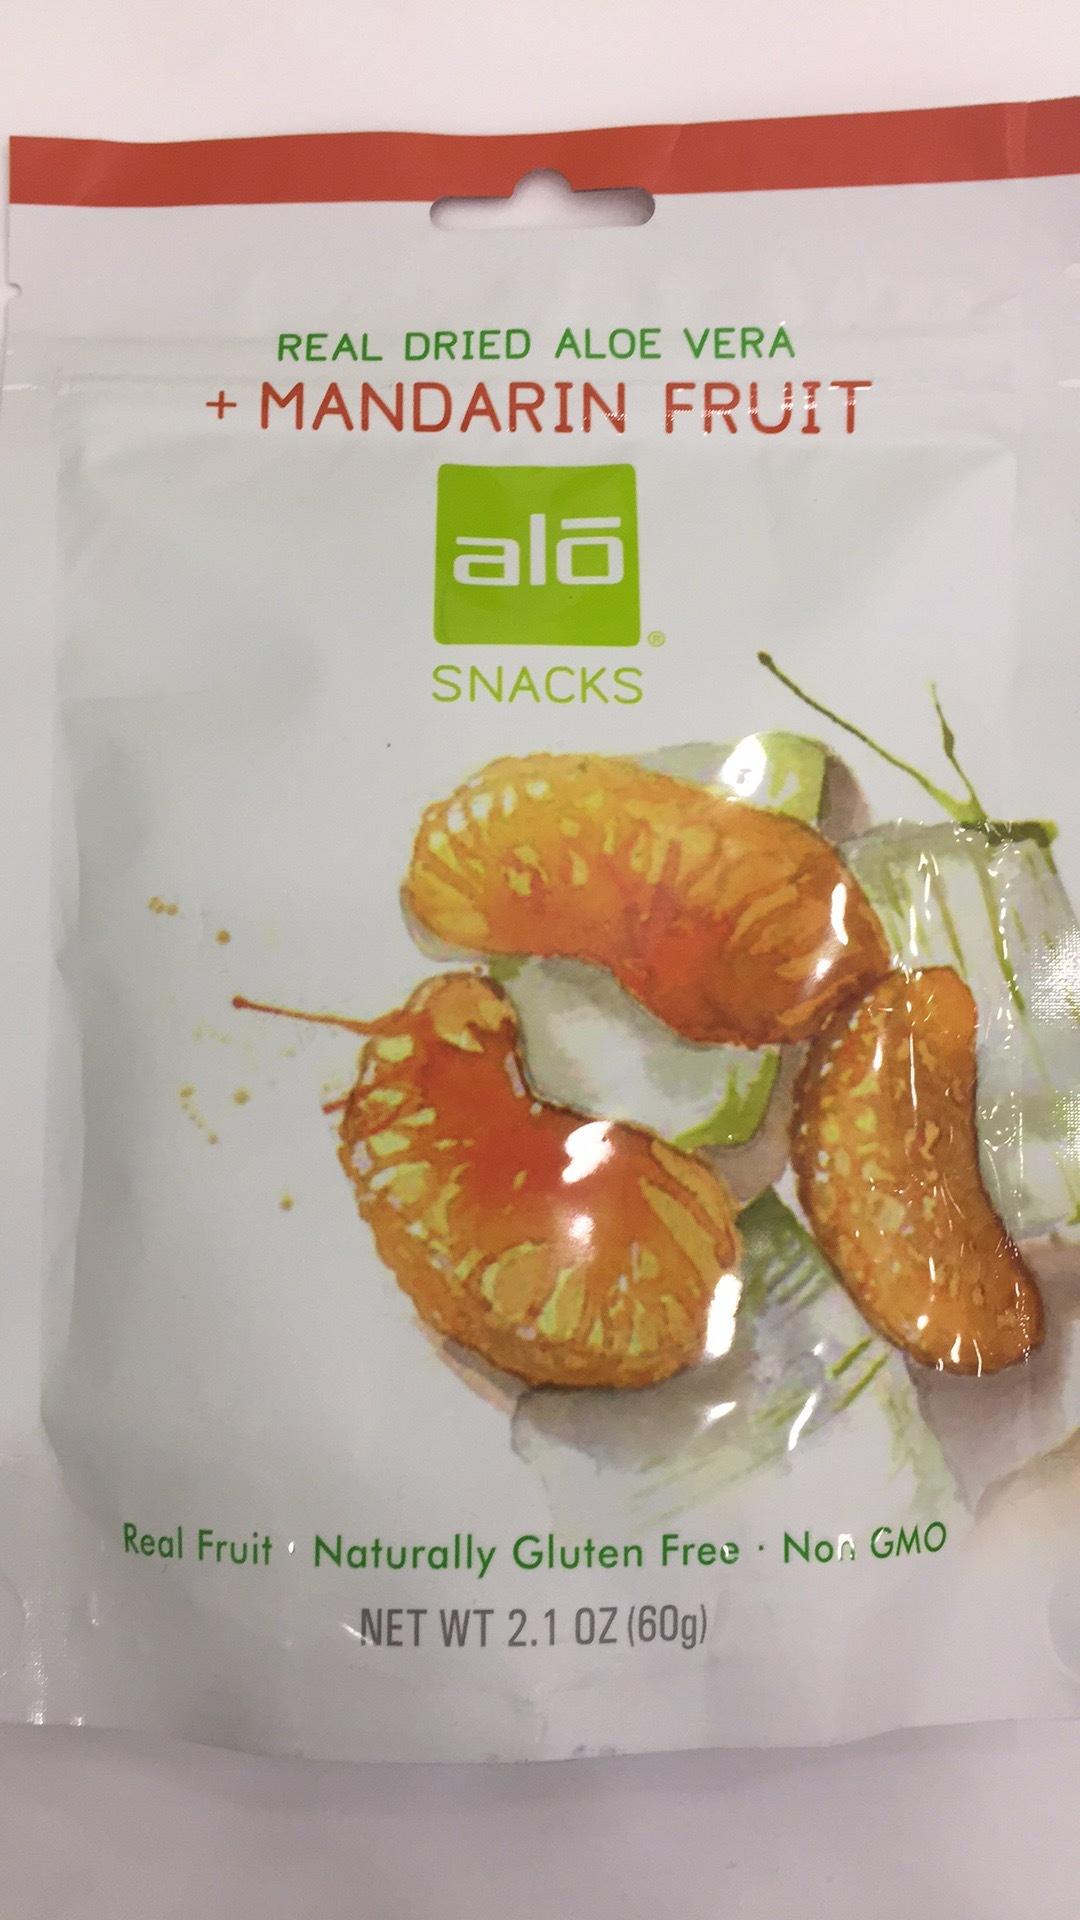 Real Dried Aloe Vera + Mandarin Fruit Snack | The Natural